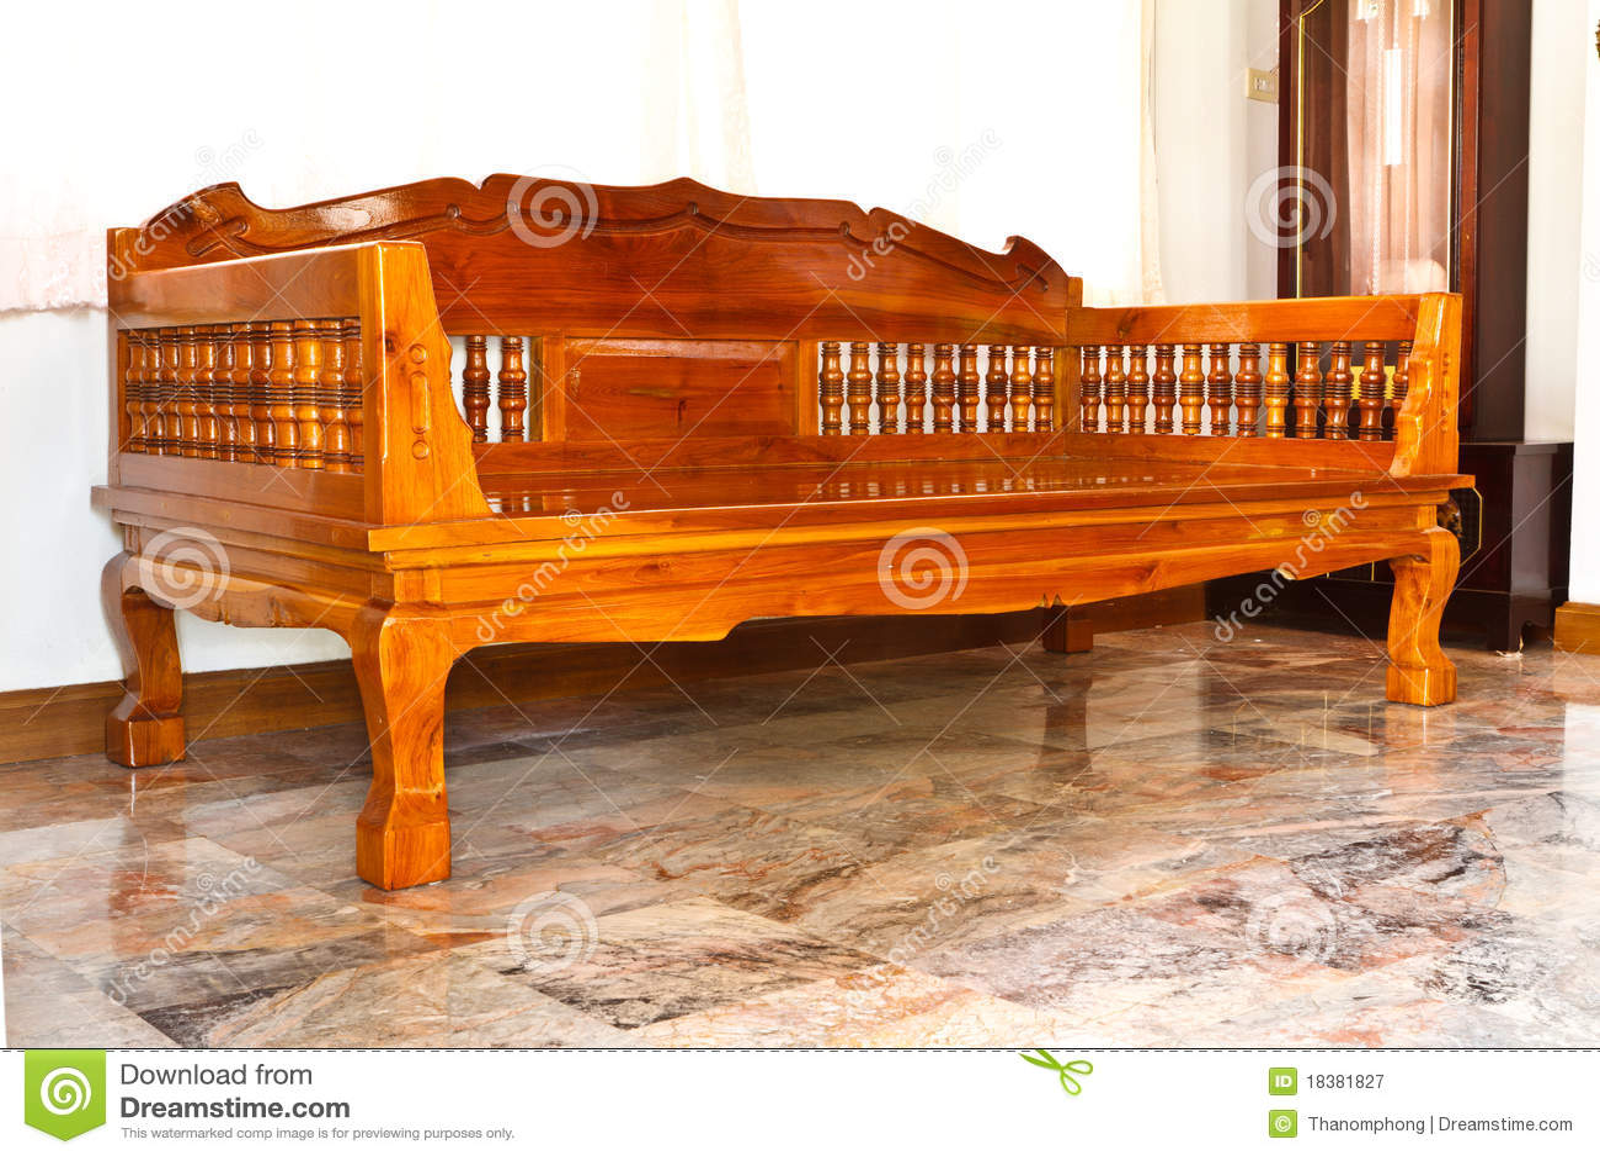 Muebles modernos de madera imagen de archivo imagen de for Muebles en madera modernos